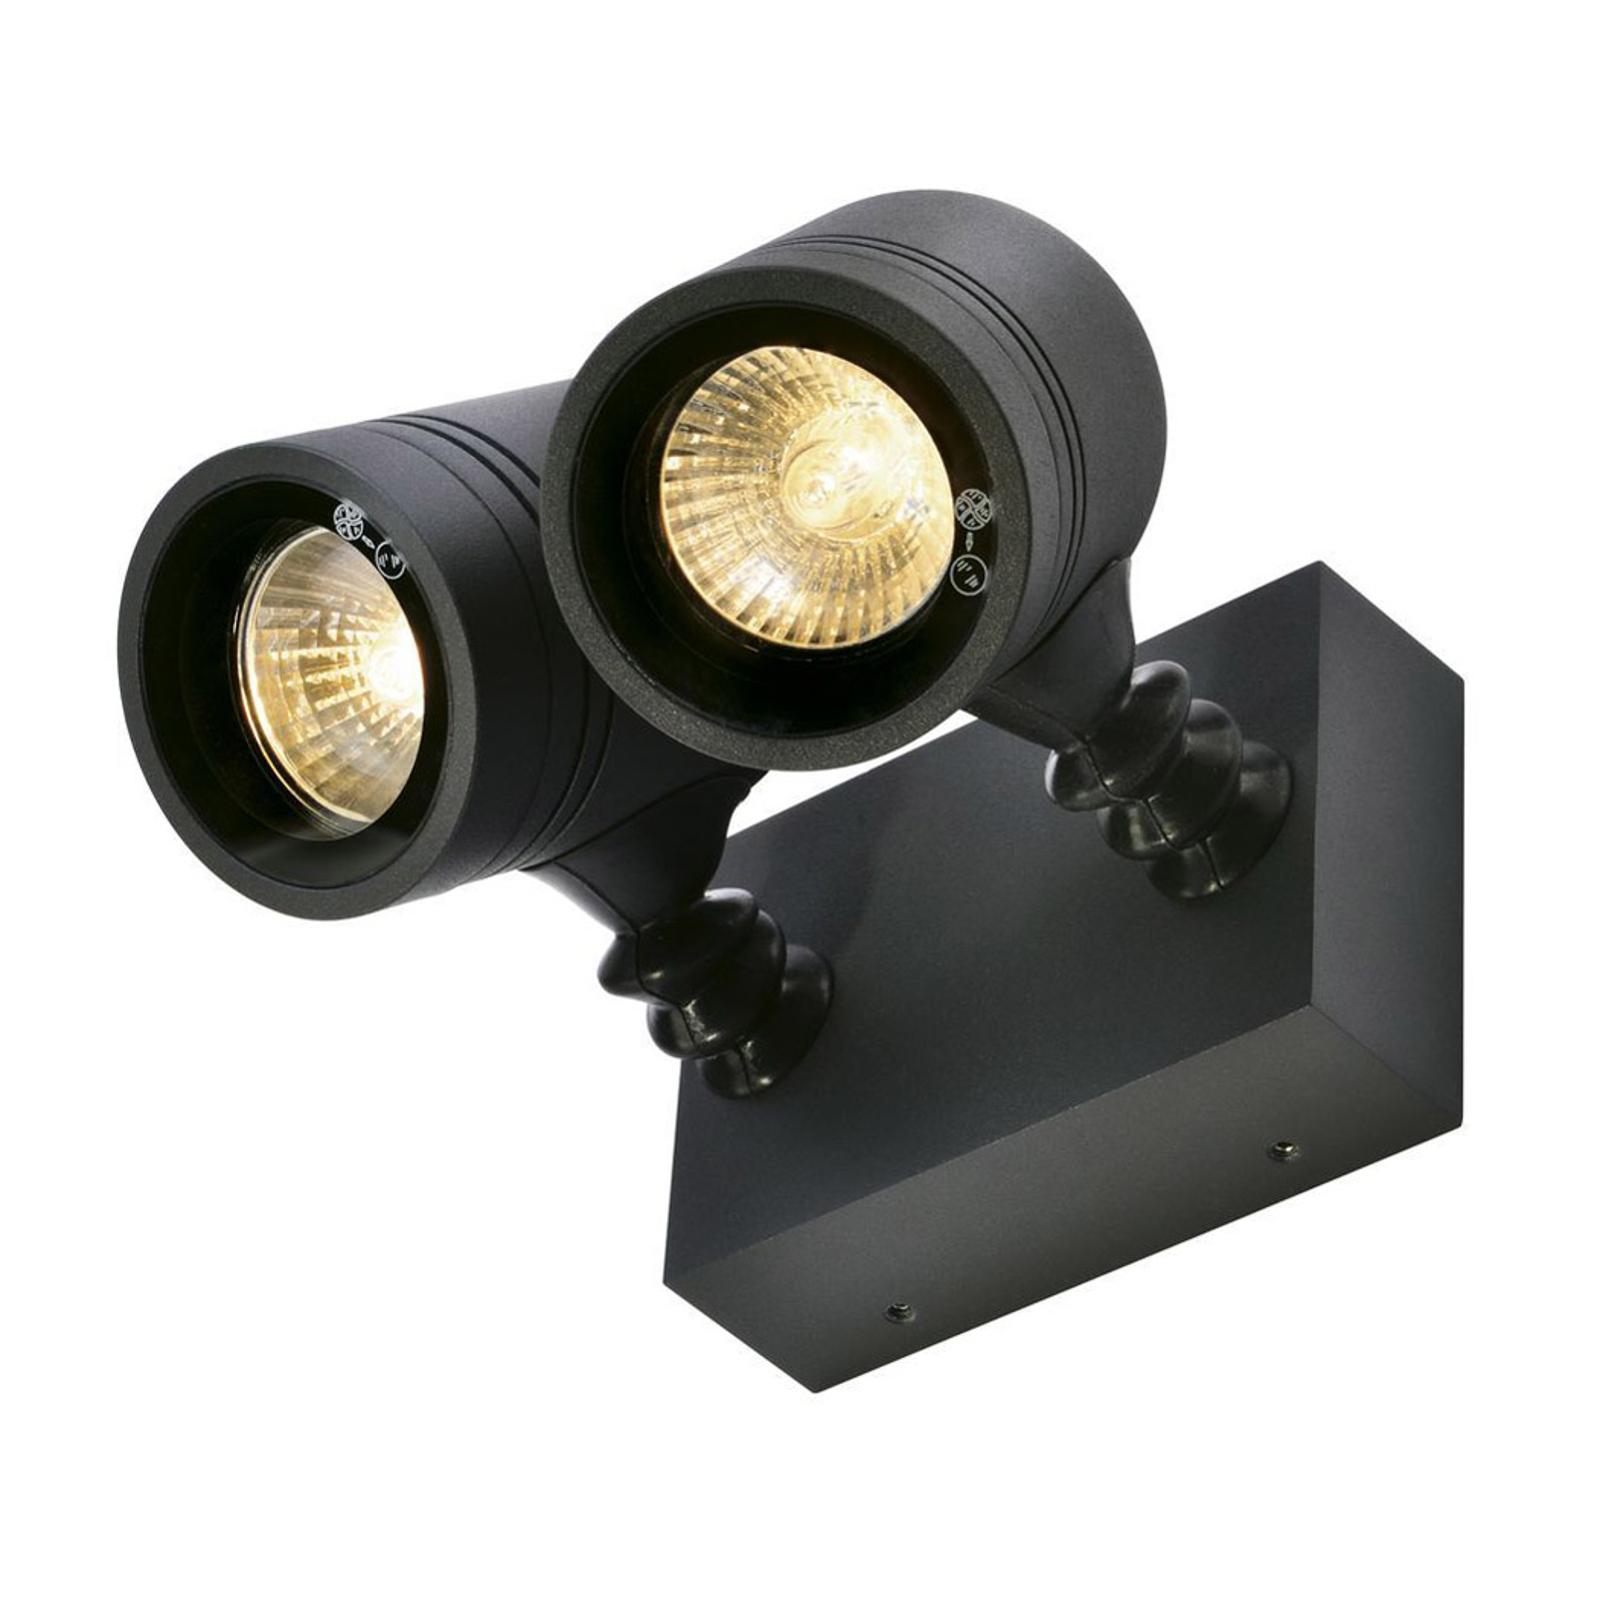 SLV Myra Außenwandlampe, 2-flammig, anthrazit